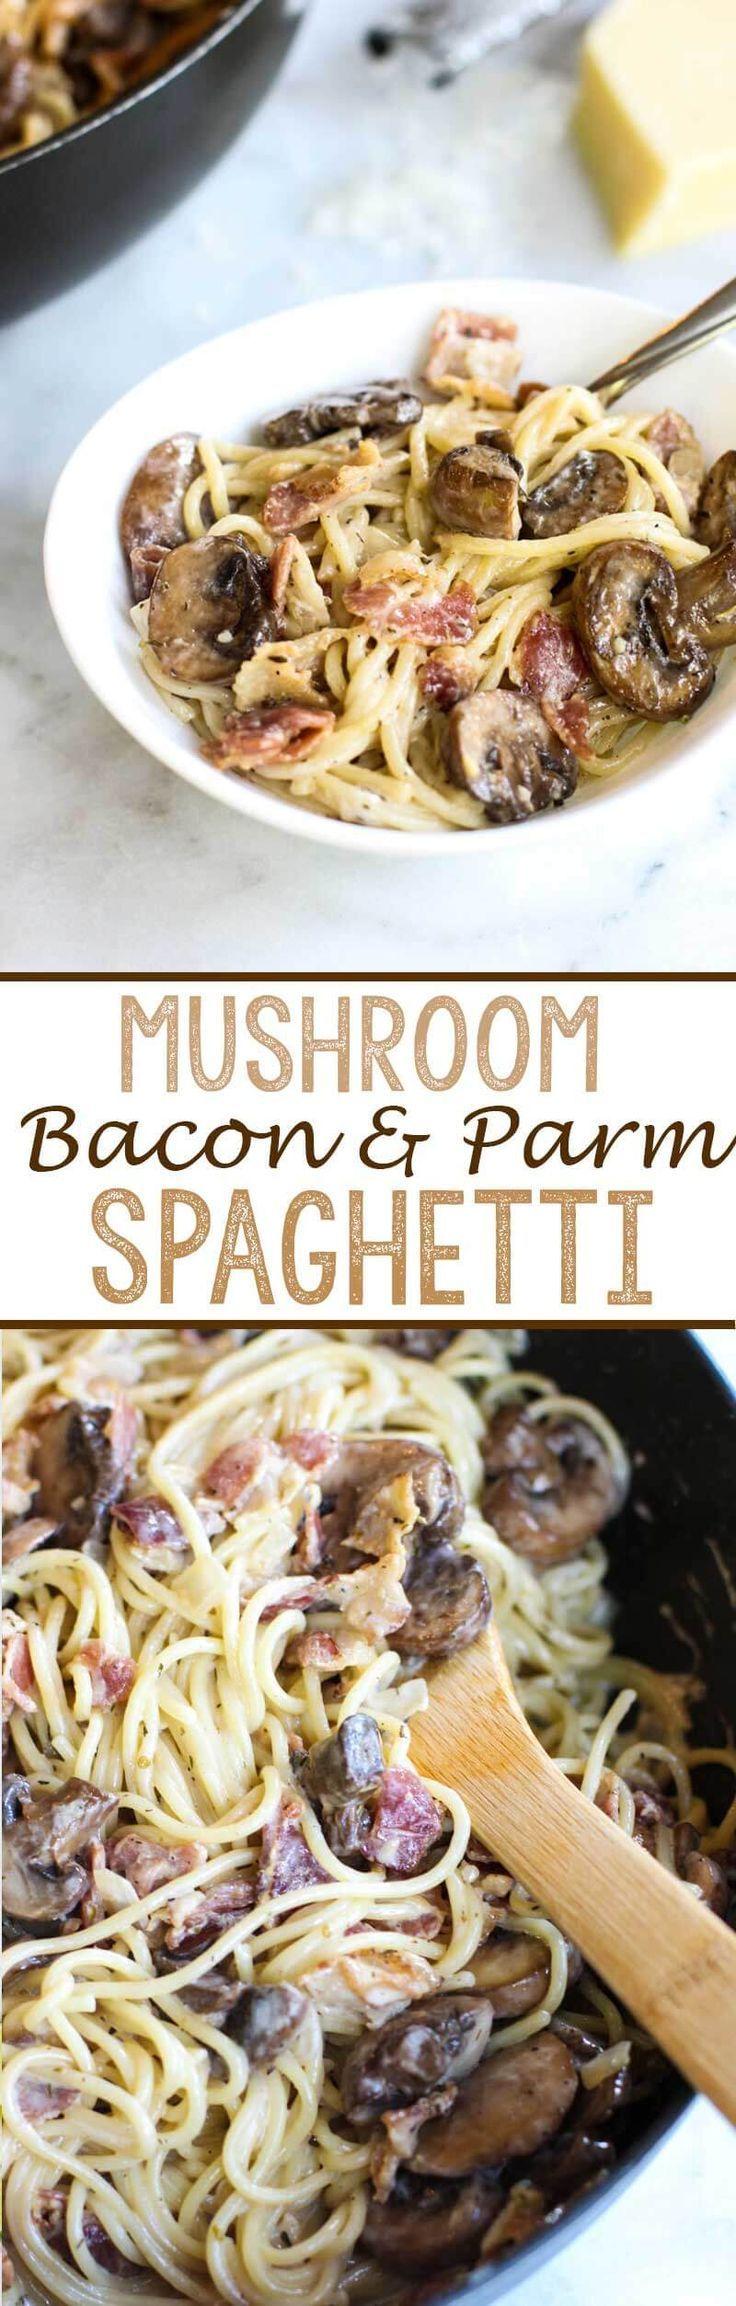 Mushroom, Bacon, and Parmesan Spaghetti - Eazy Peazy Mealz